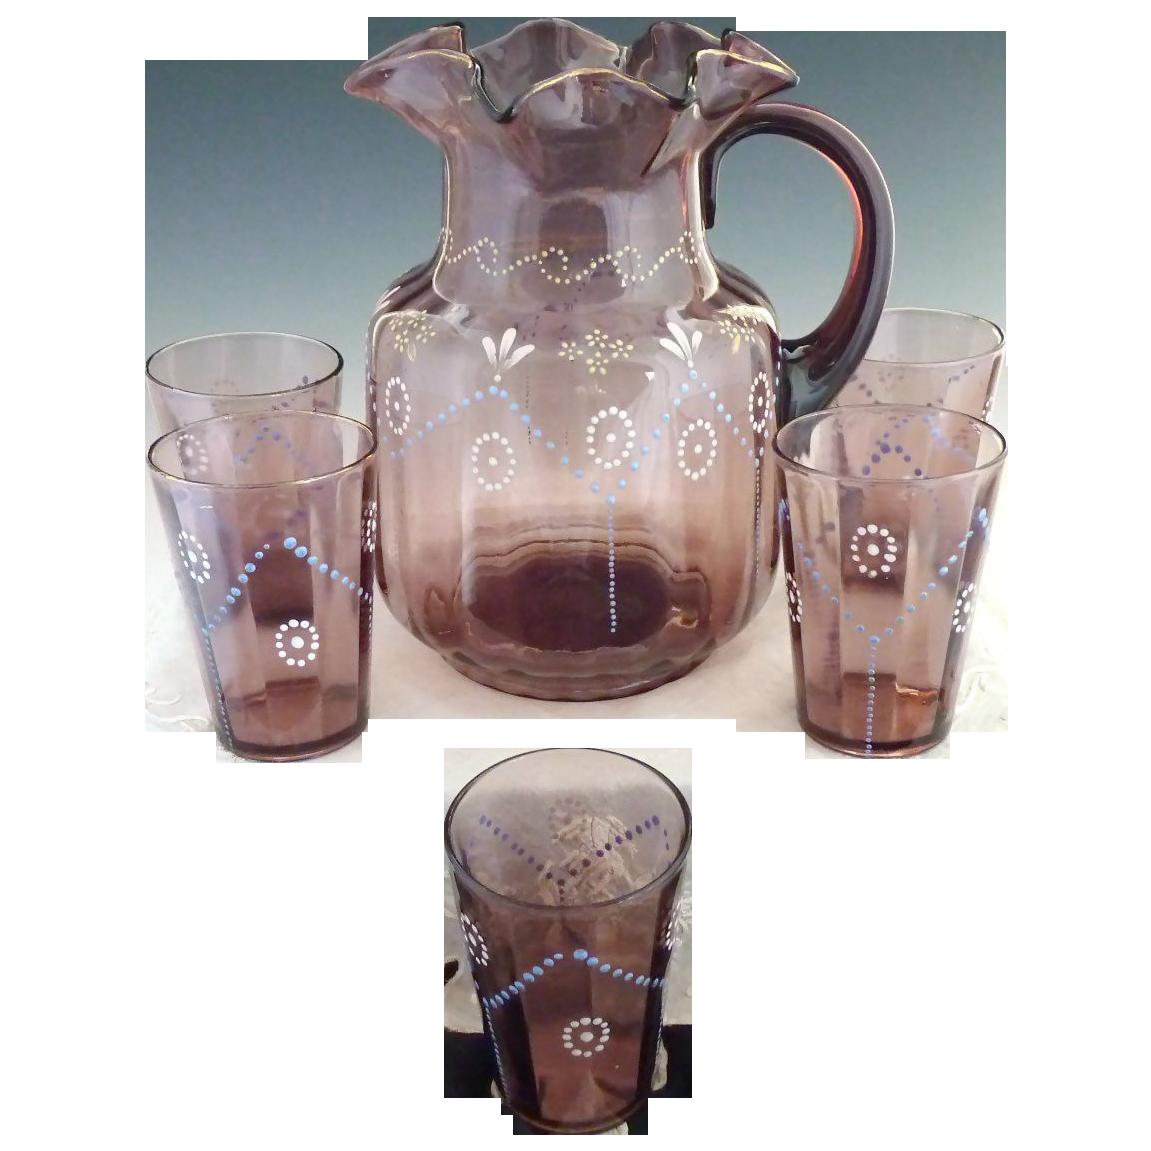 Antique amethyst glass pitcher glass set paneled hand enameling